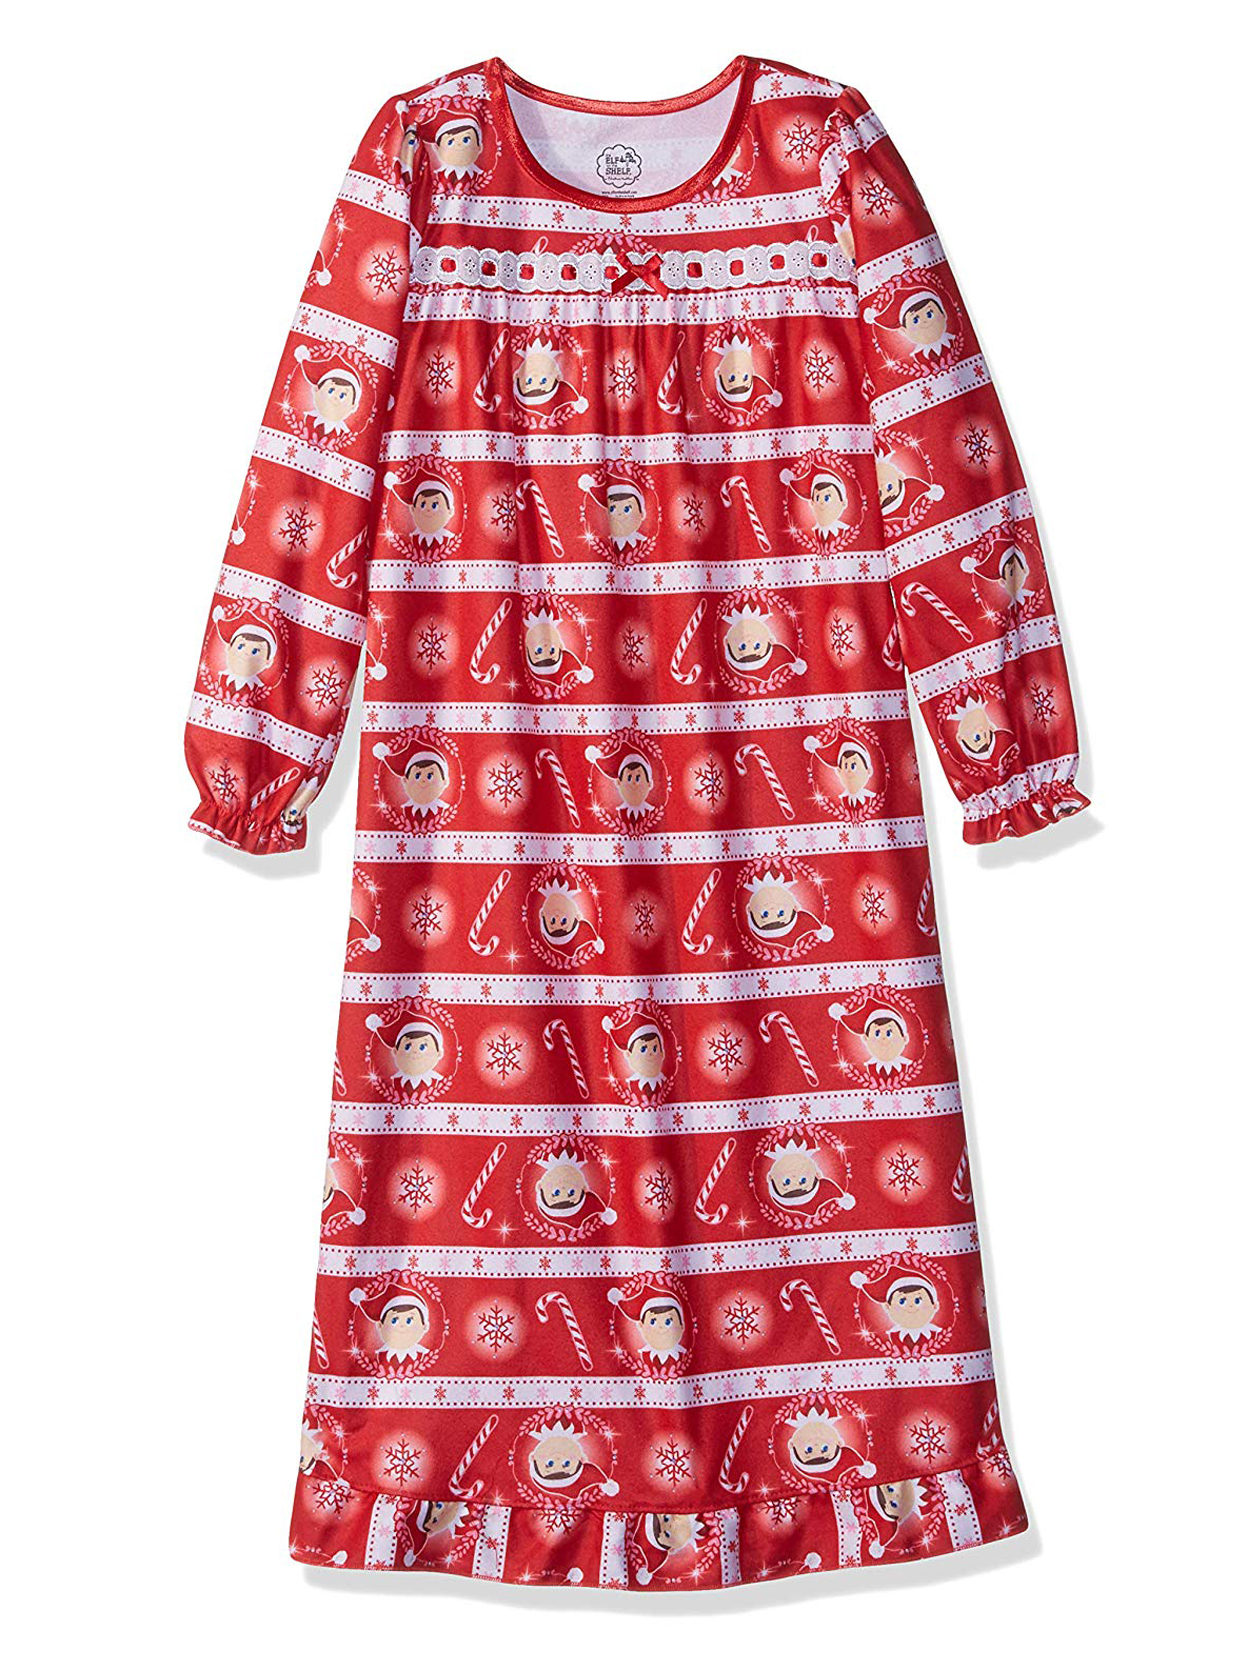 Elf on the Shelf Girls Christmas Holiday Granny Nightgown Pajamas 21EF133GGL